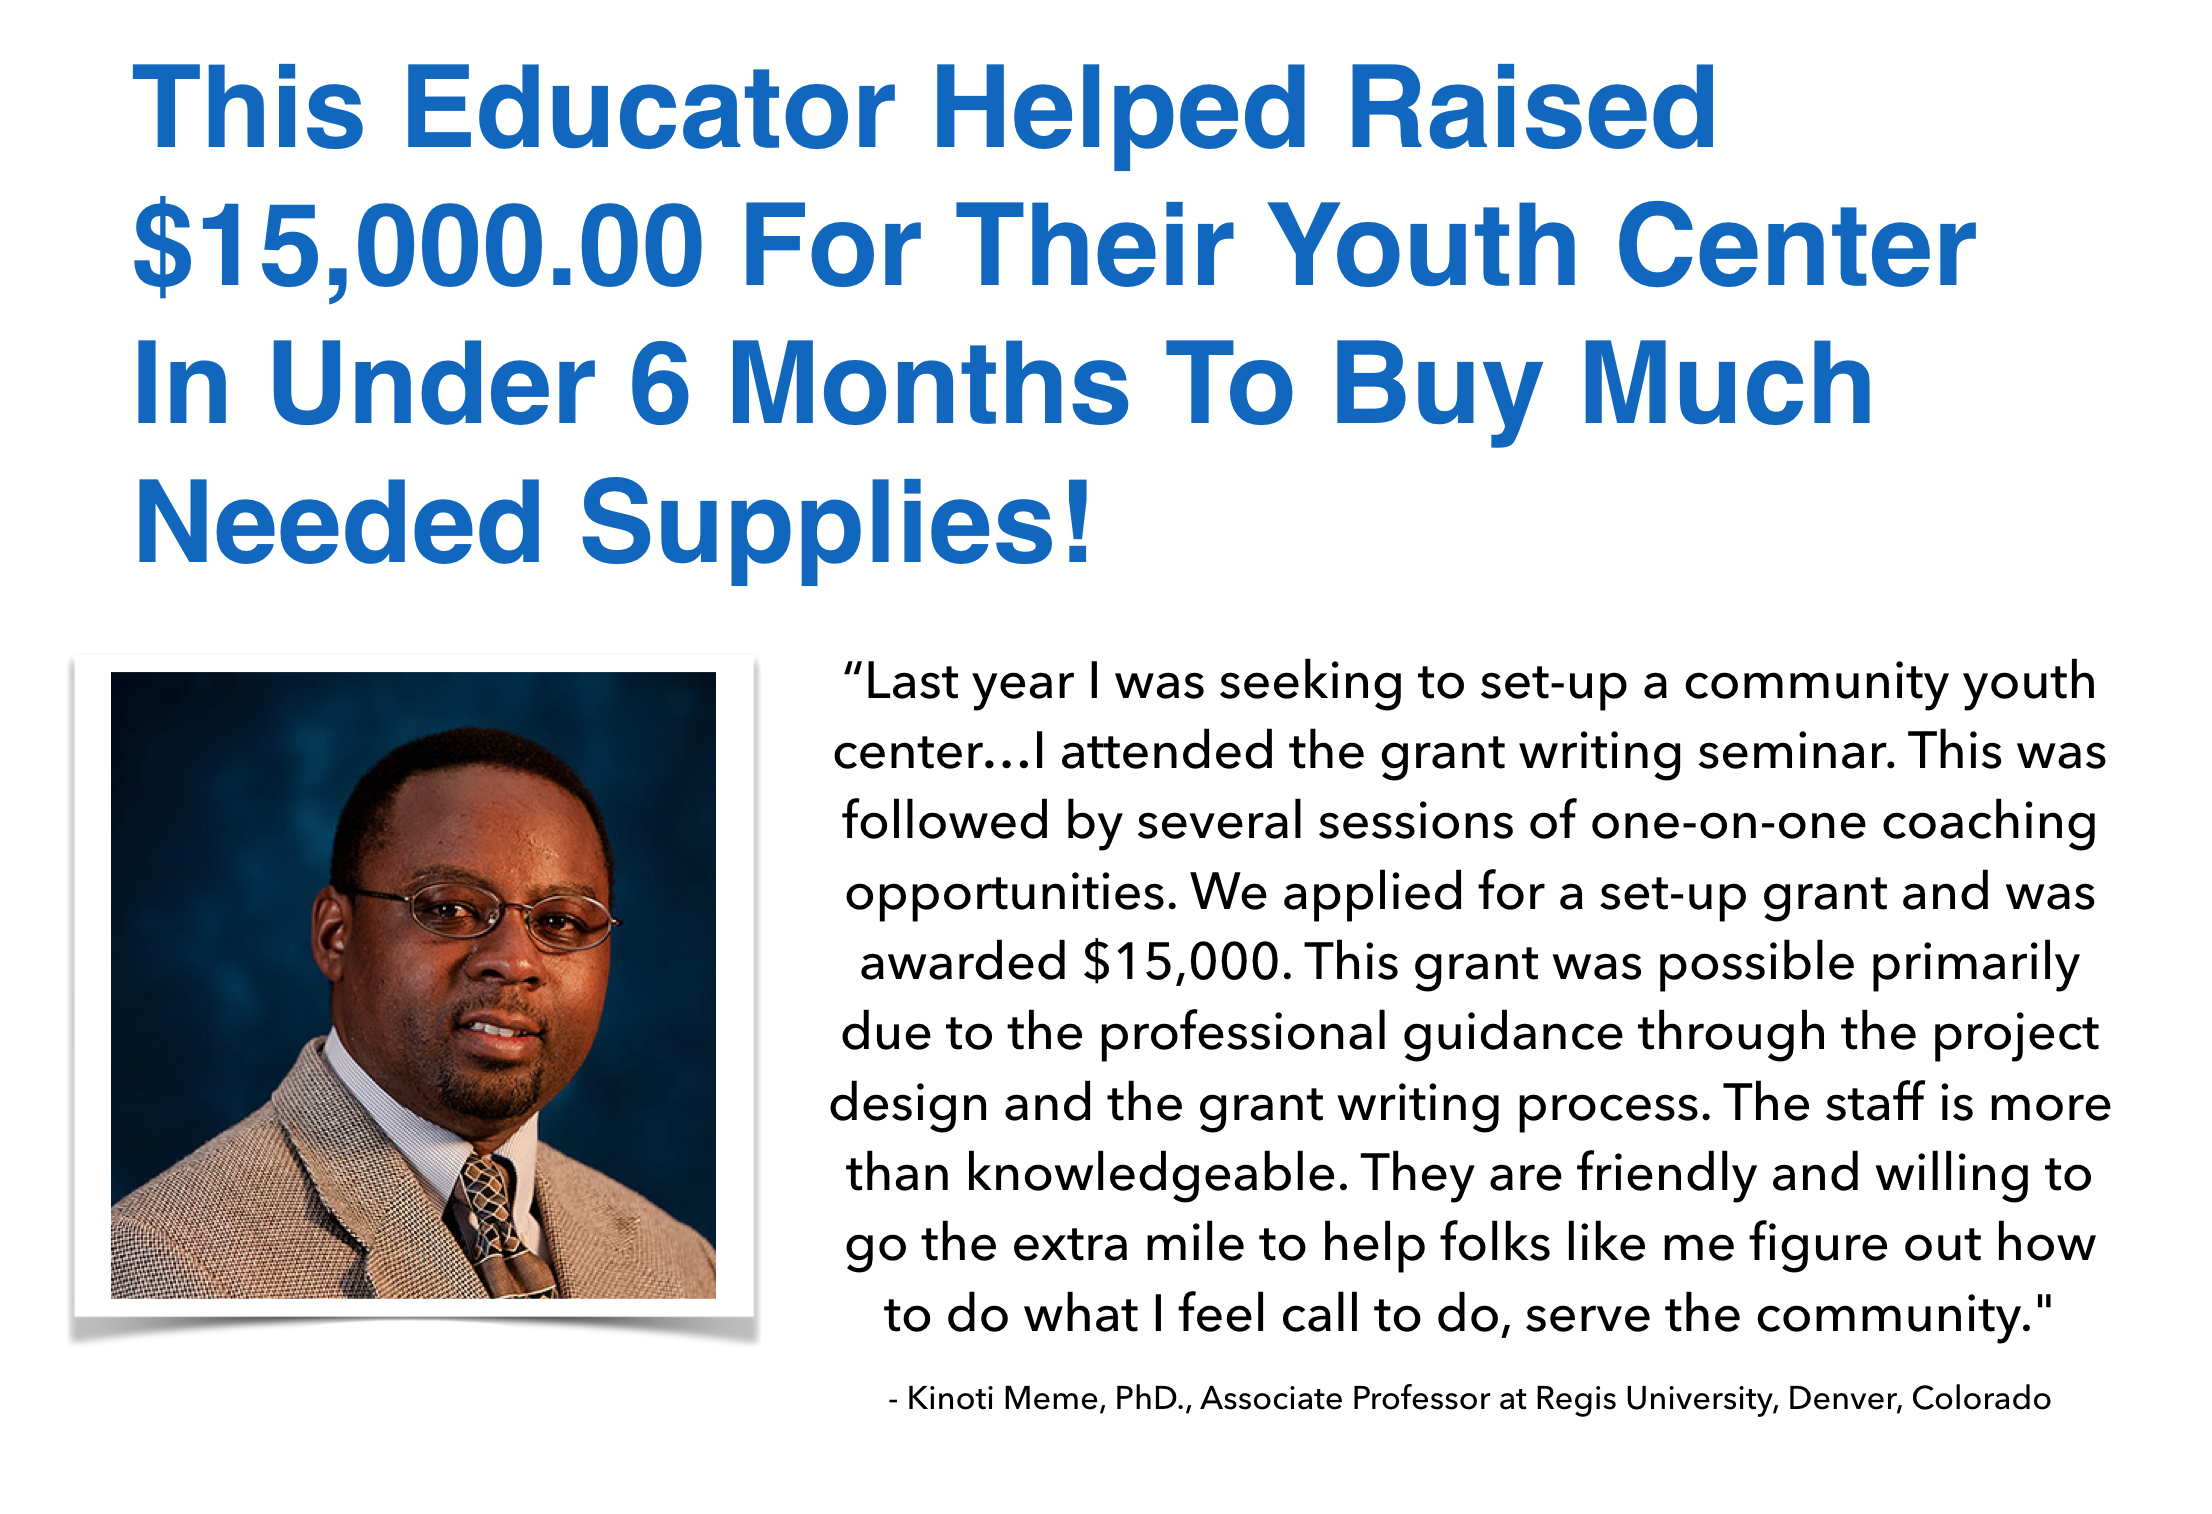 jPcKHtOjRg6gRgCWIXeW_Kinoti Meme learn to write grants that get funded \